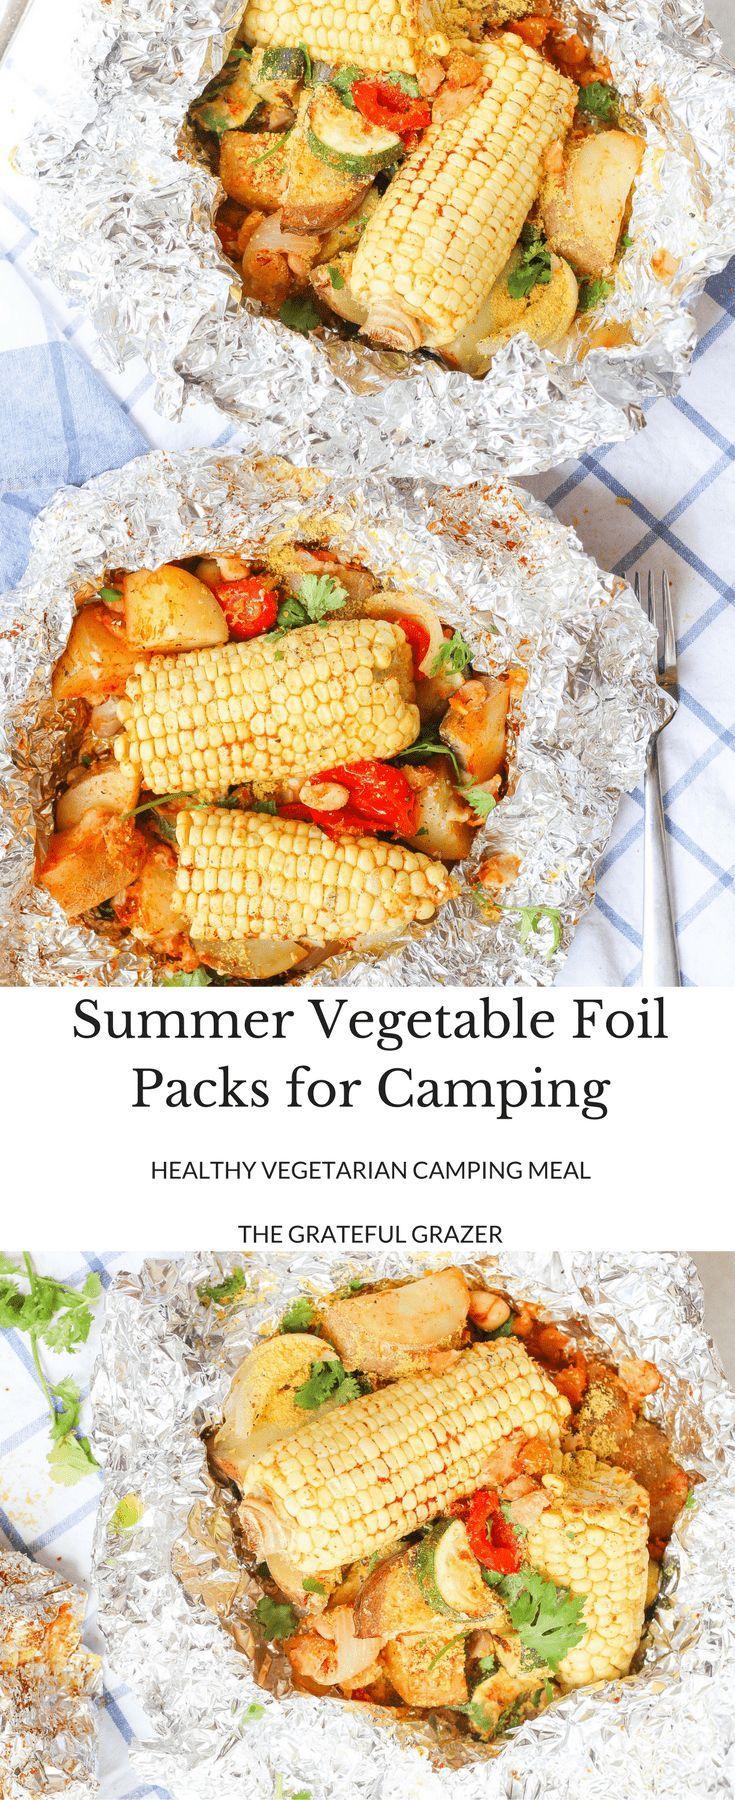 Summer Vegetable Foil Packs For Camping